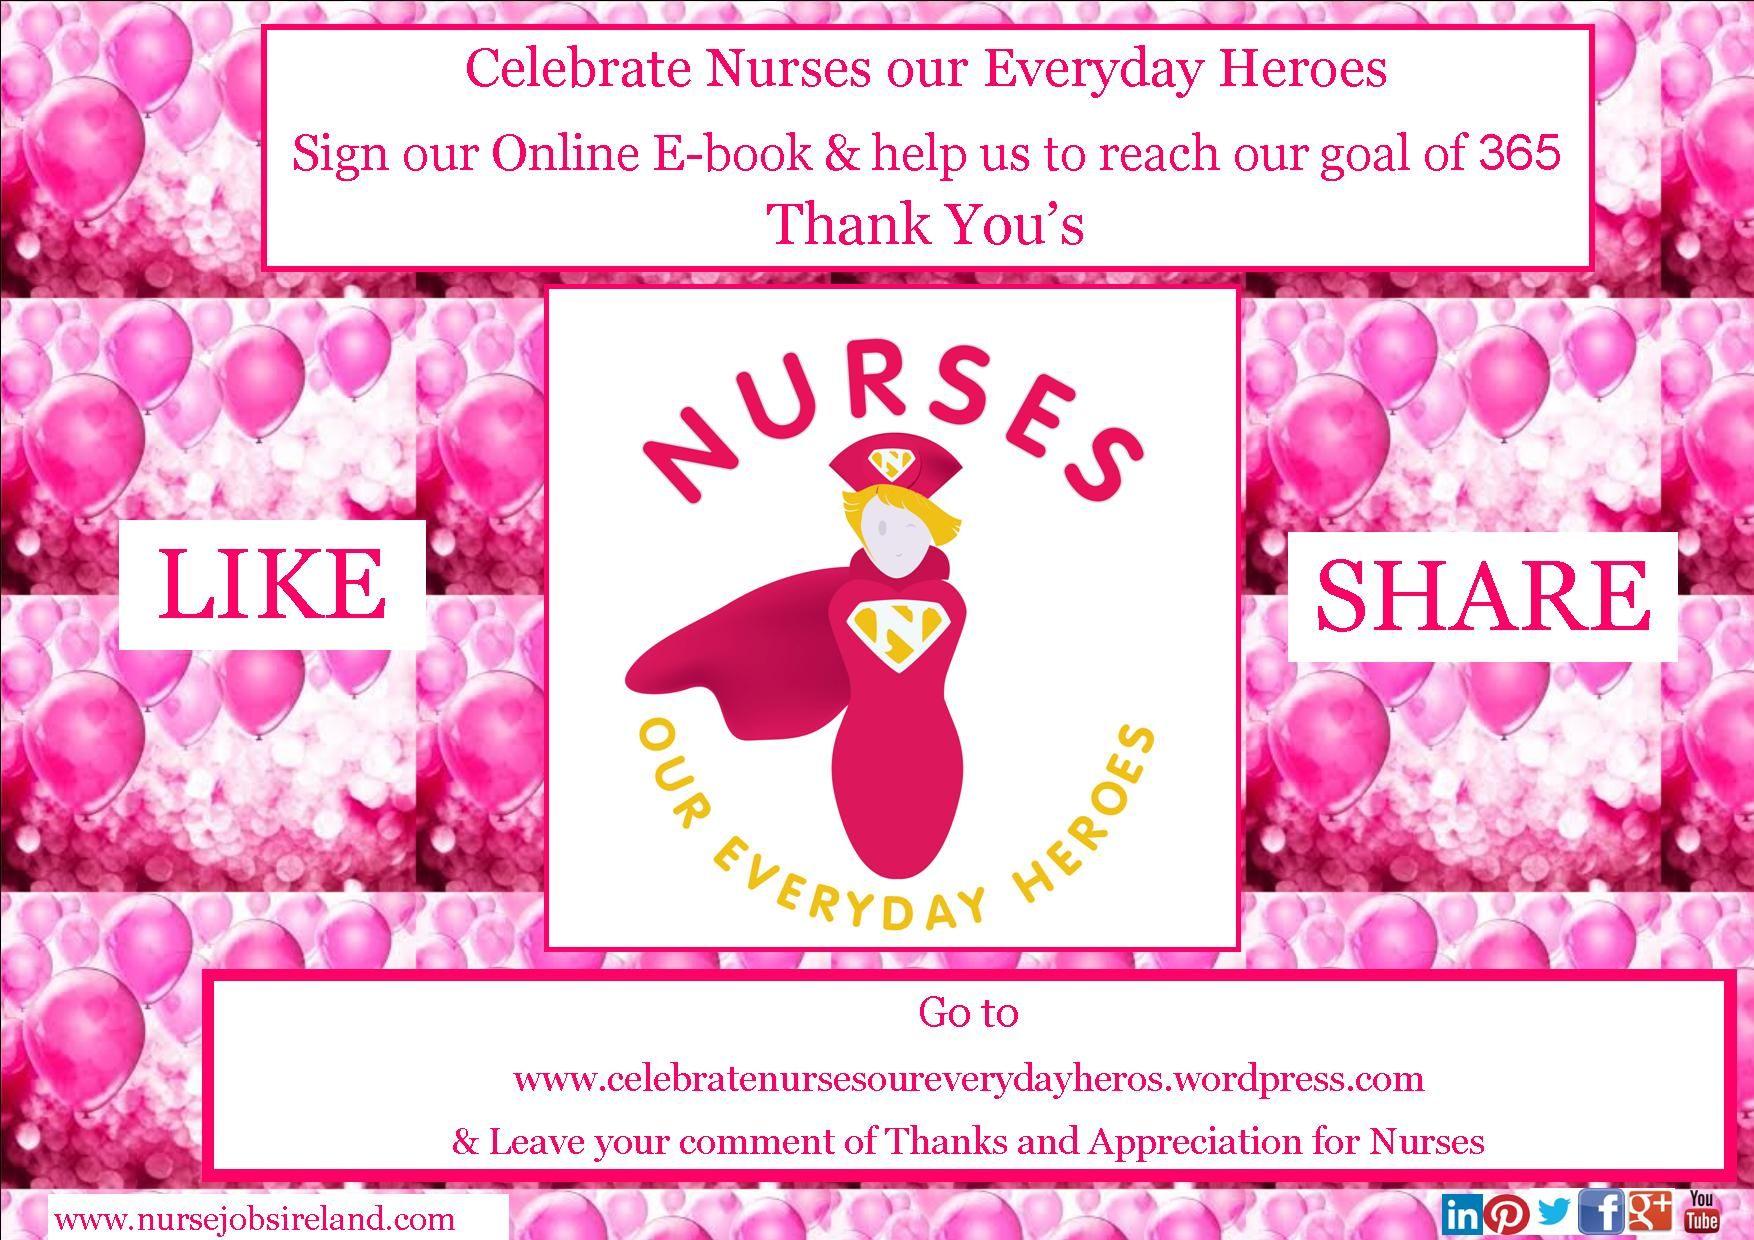 Help nurse jobs ireland reach our goal of 365 thank yous